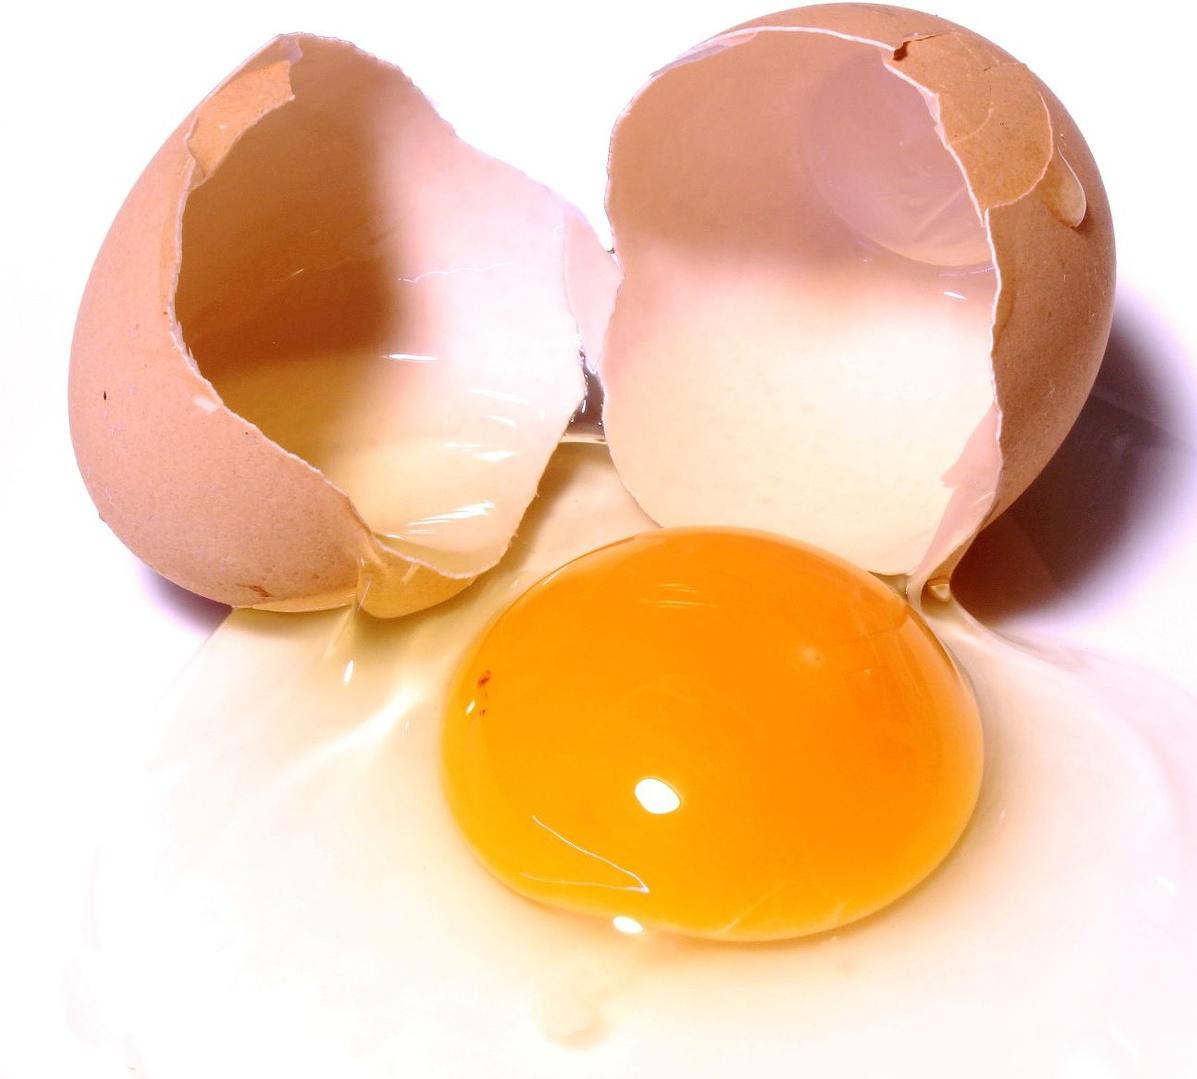 Egg is great for moisturizing hair.